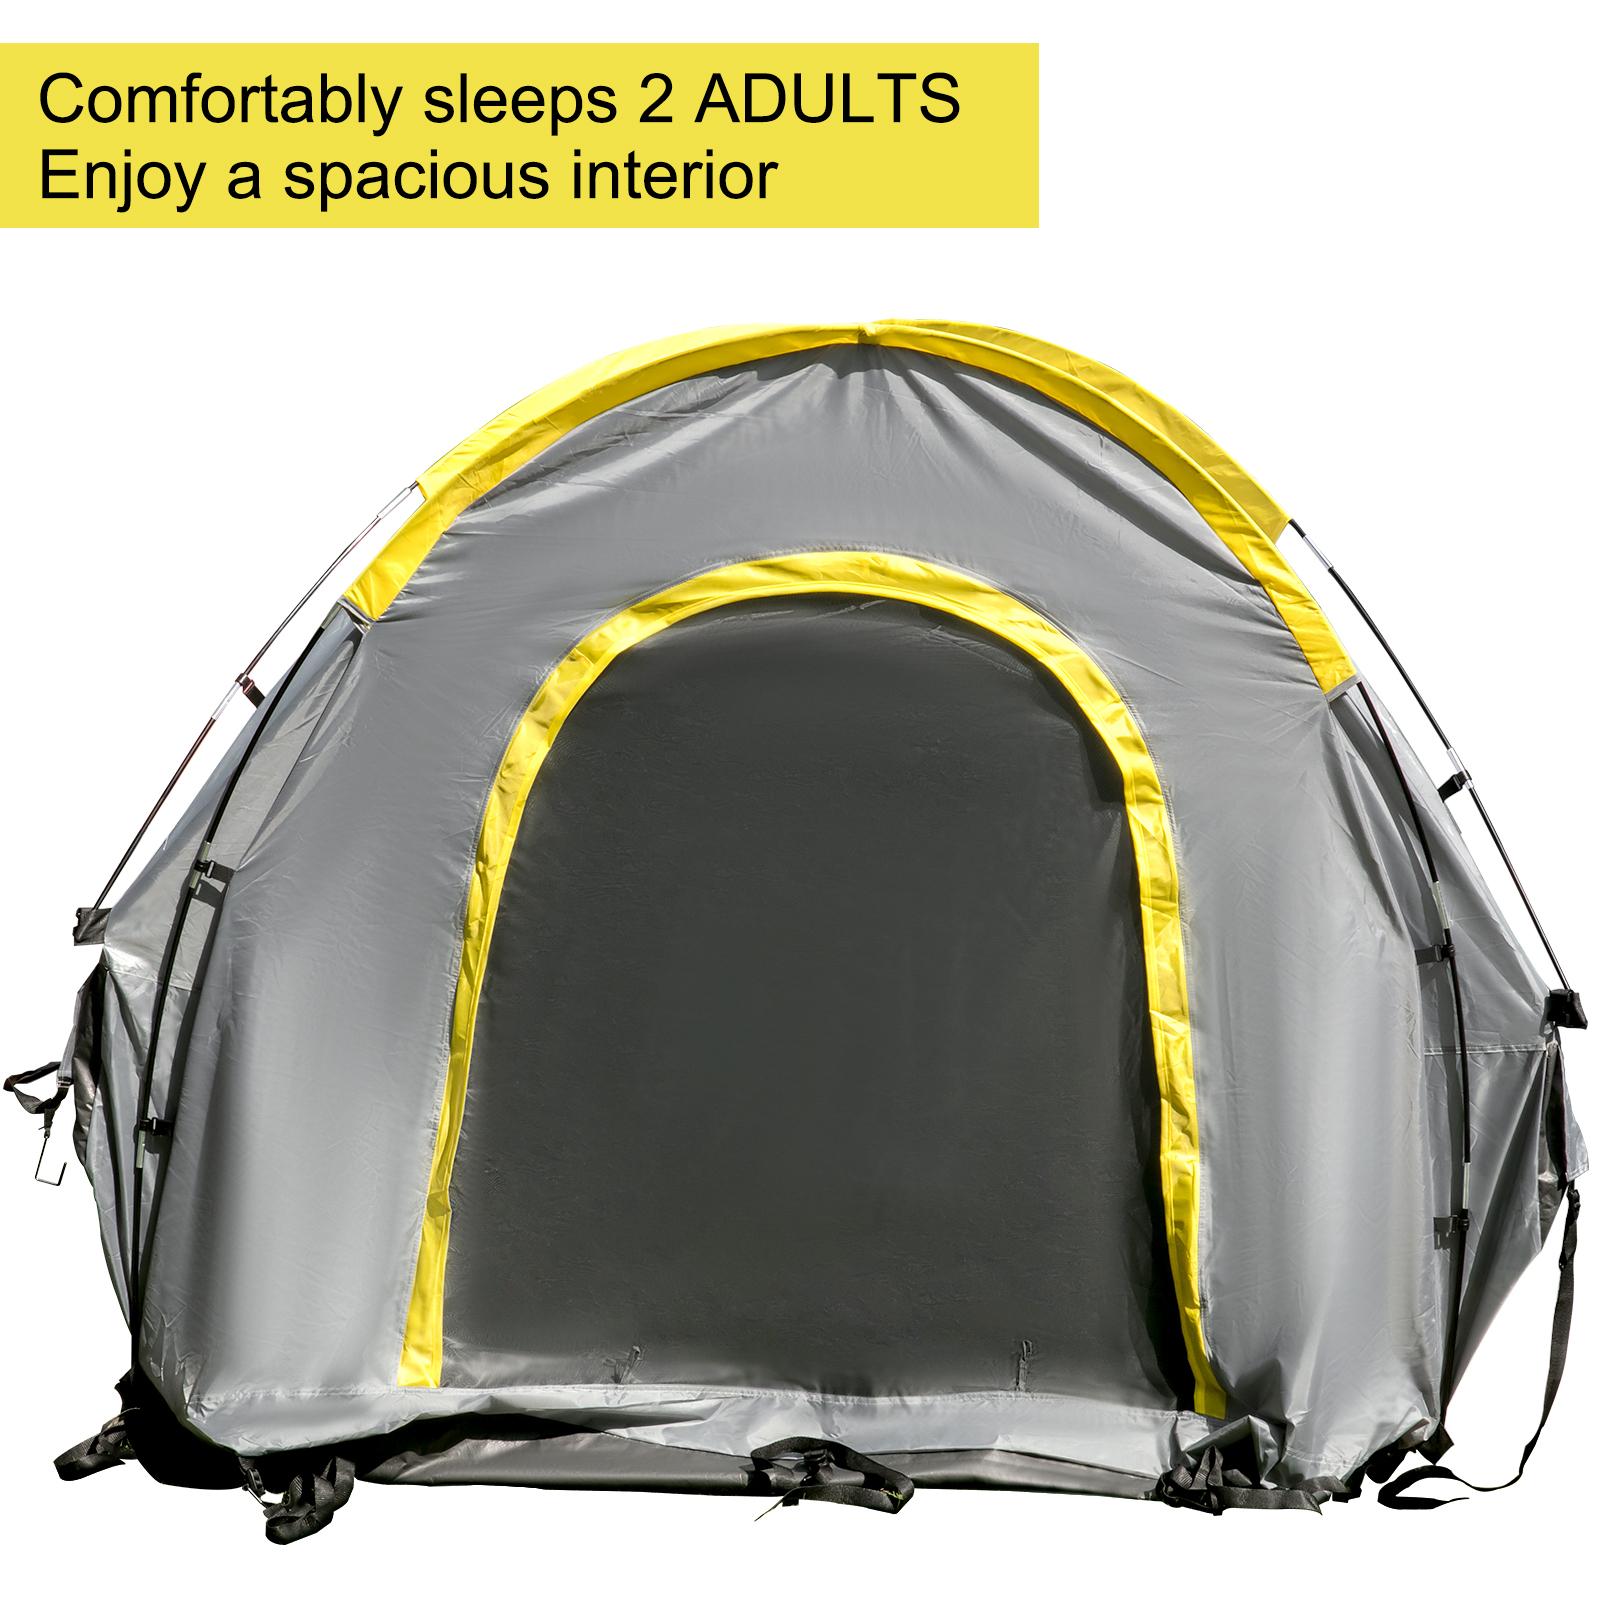 thumbnail 5 - VEVOR Truck Tent Truck Bed Tent 5' - 8' Pickup Tent Waterproof Outdoor Camping